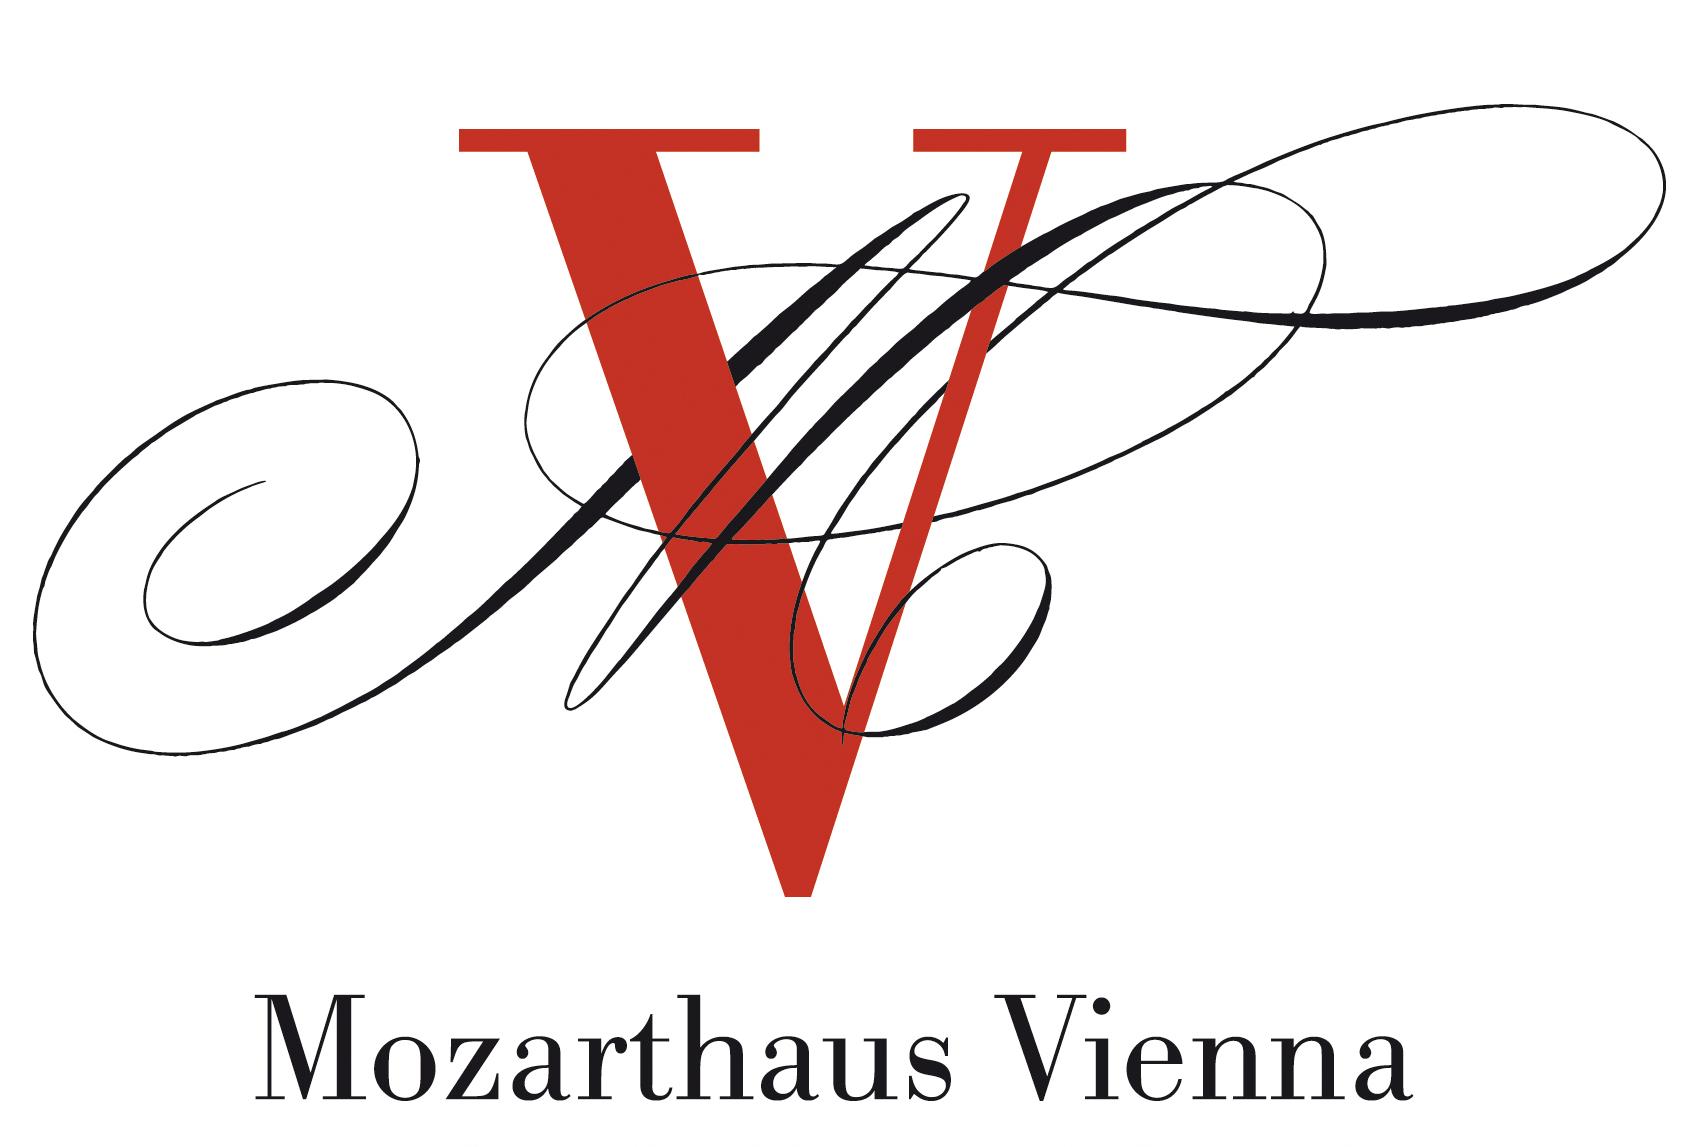 Mozarthaus